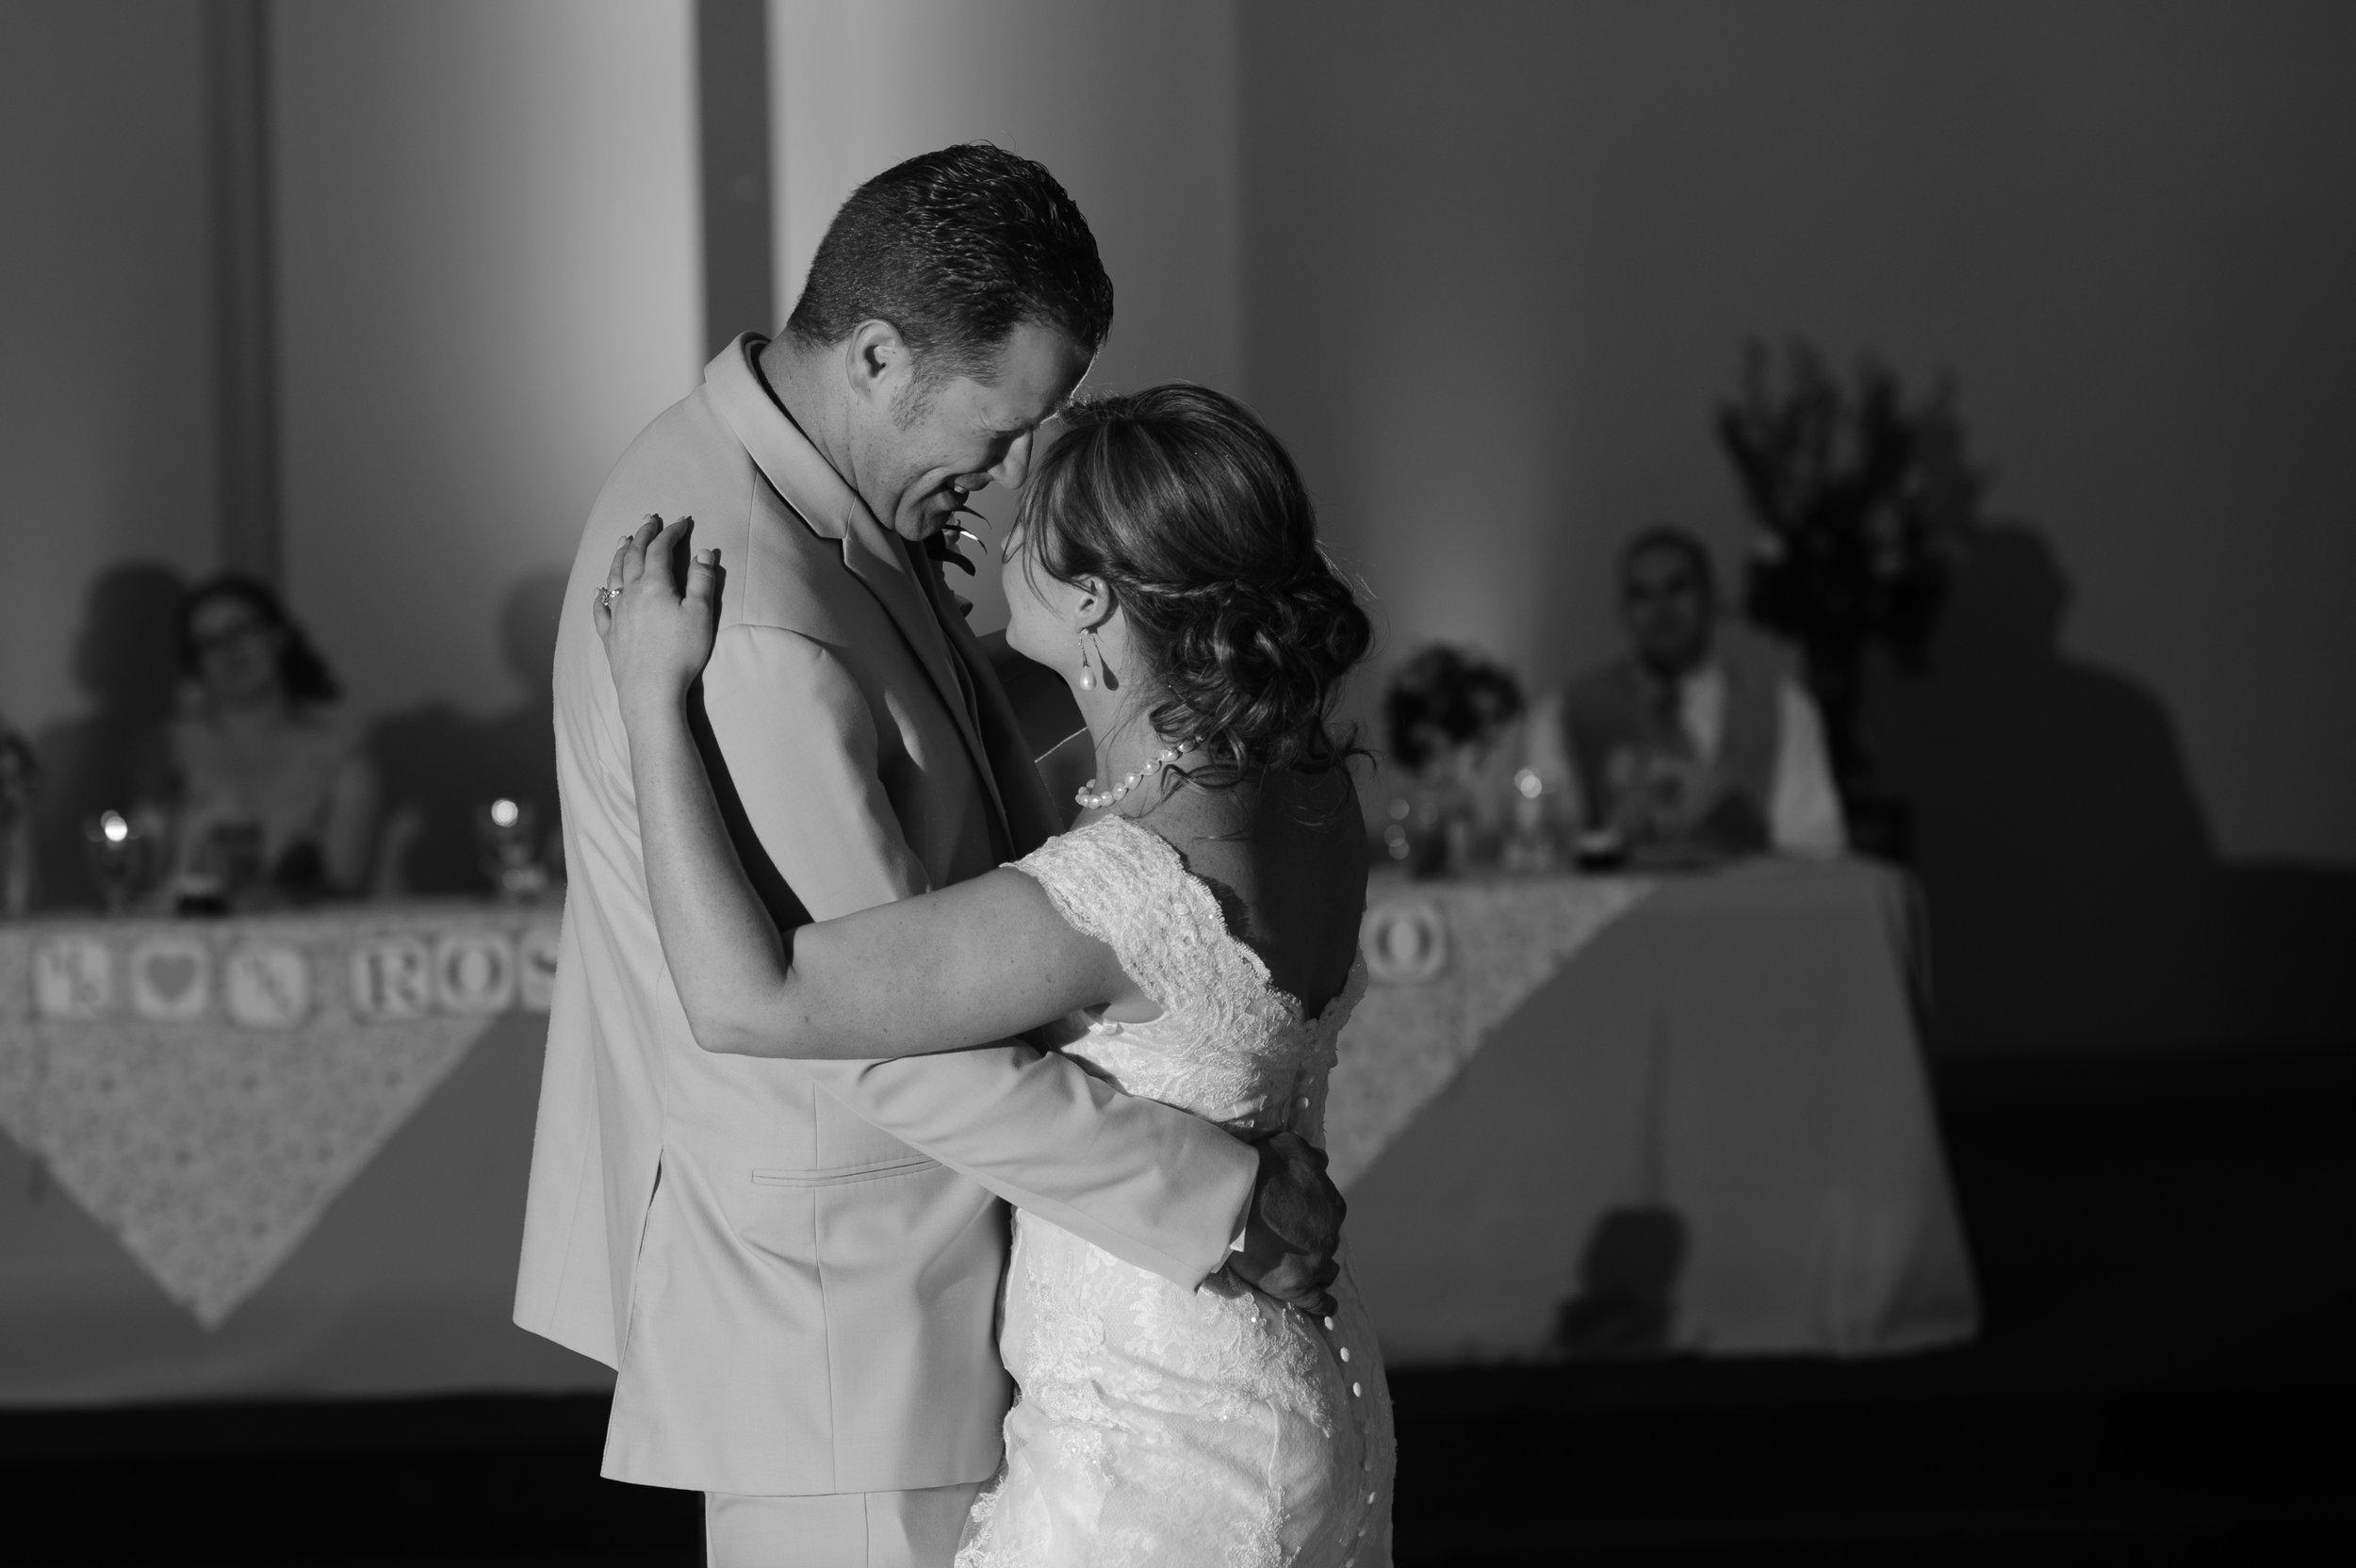 danielle-ross-017-sacramento-wedding-photographer-katherine-nicole-photography.JPG